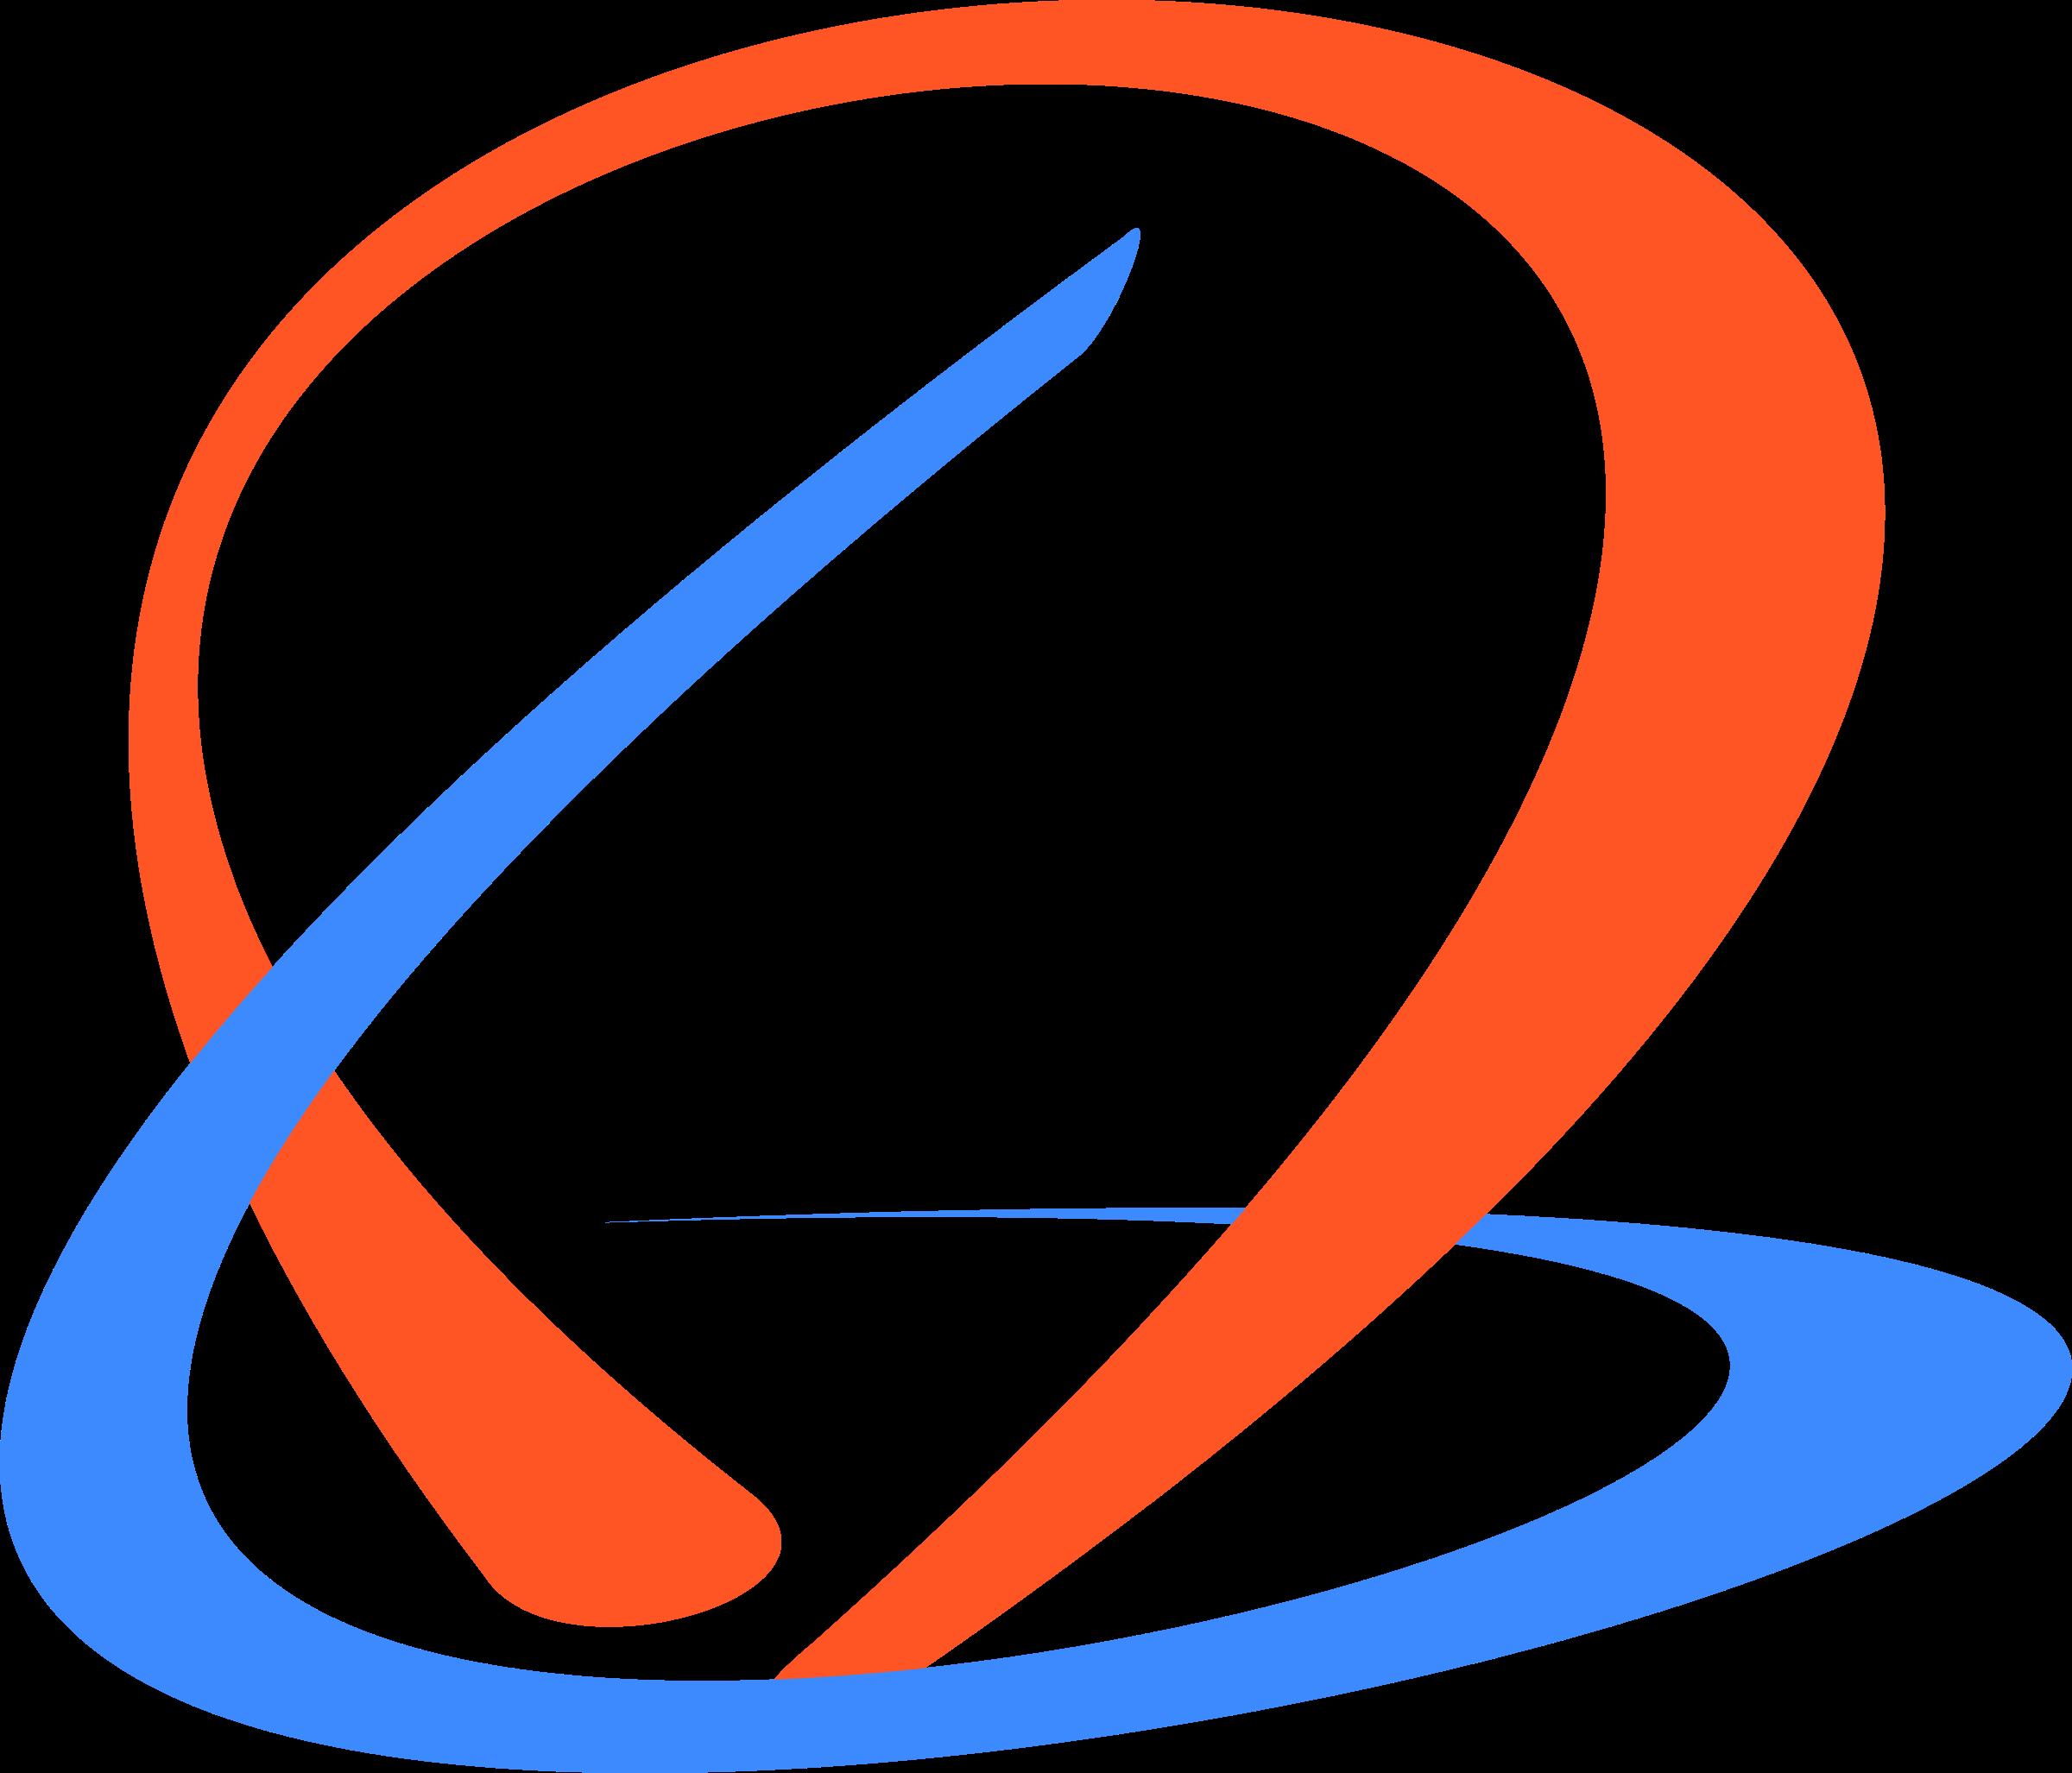 Company Logos clipart symbol With Art clipart schliferaward Clip